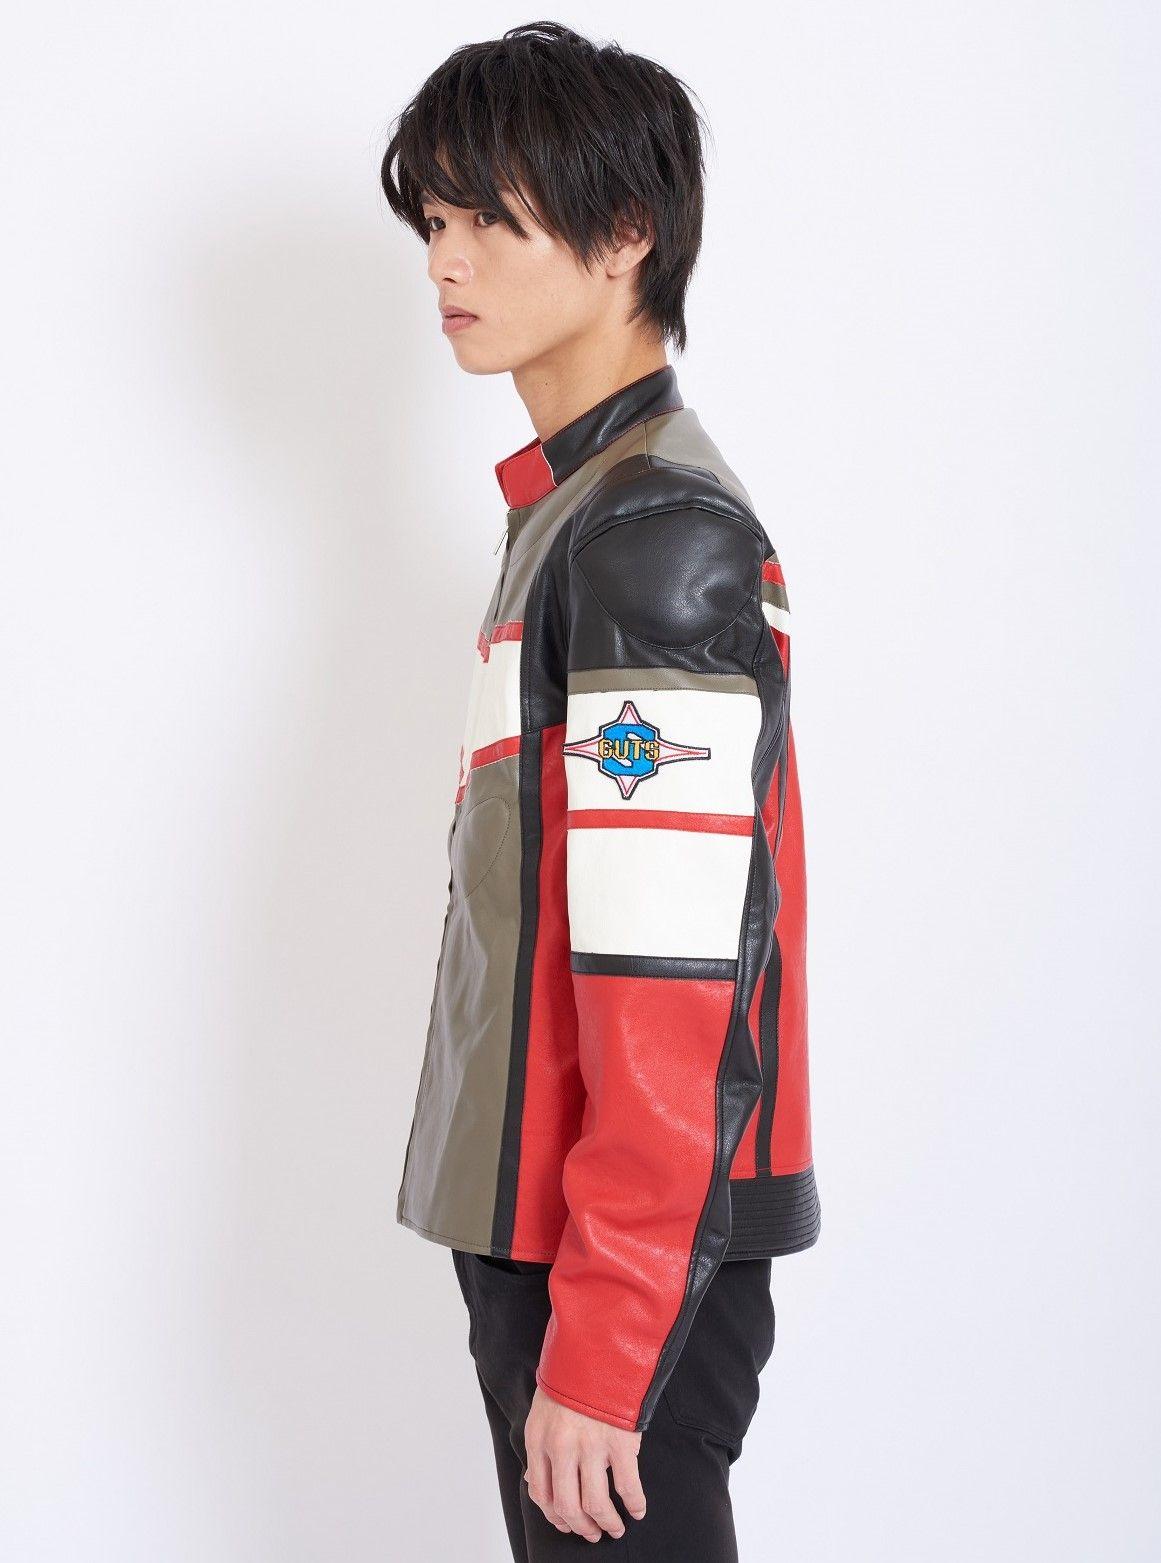 Ultraman Dyna Super GUTS Uniform Jacket